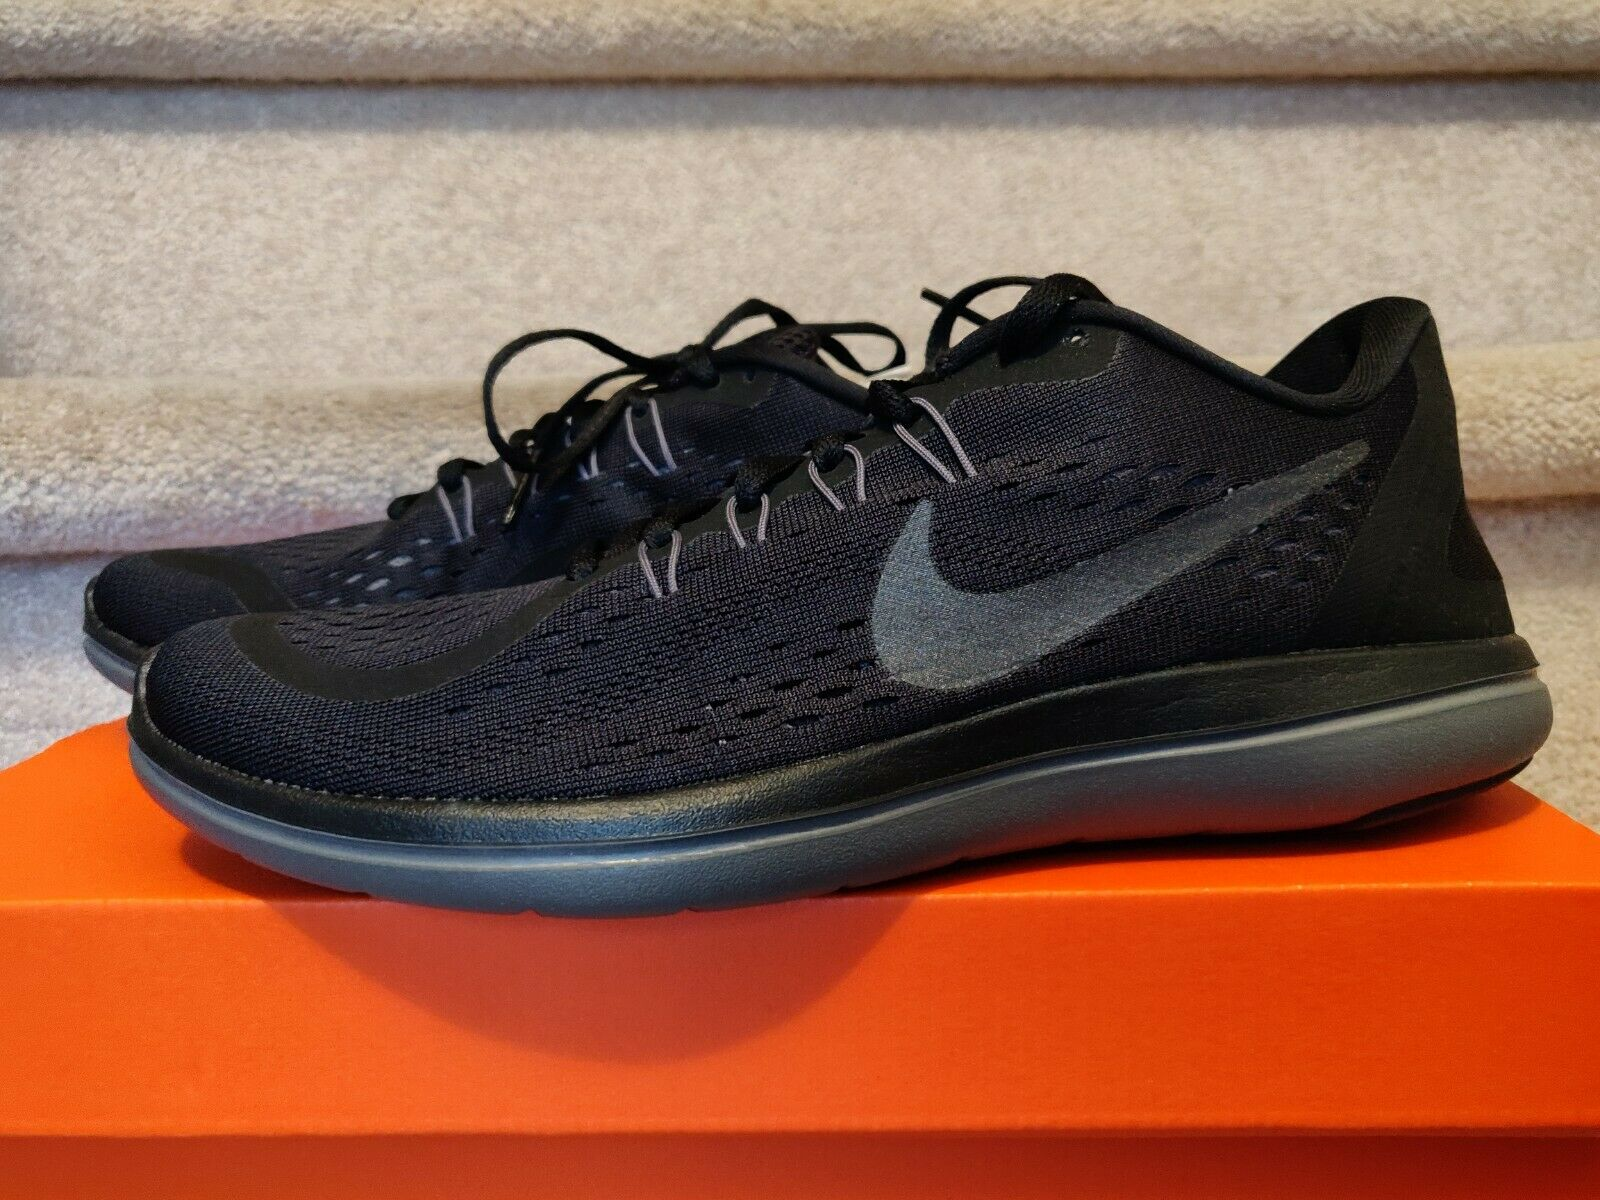 79e94e8c8bb1b Nike Flex 2017 RN Mens 898457-005 Black Anthracite Mesh Running ...